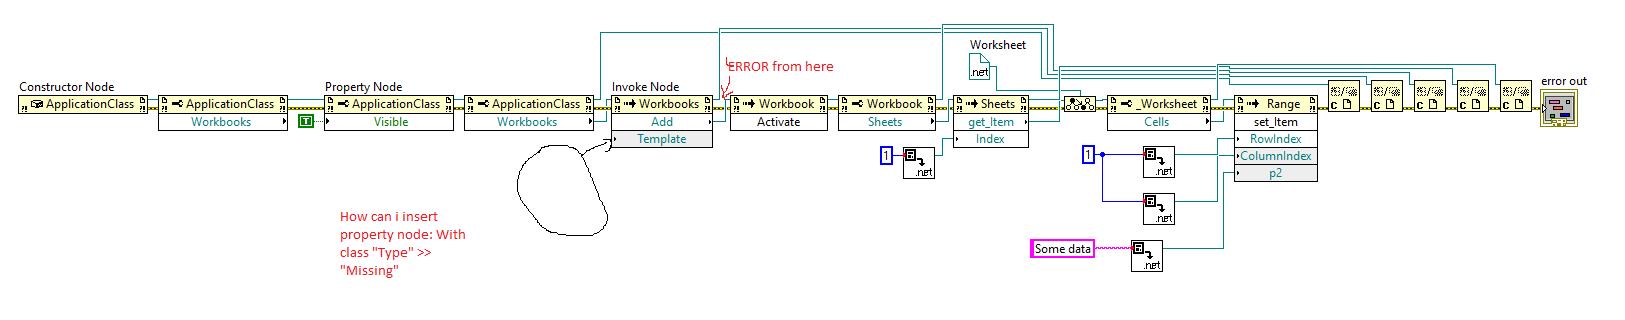 Excel_Sheet.PNG